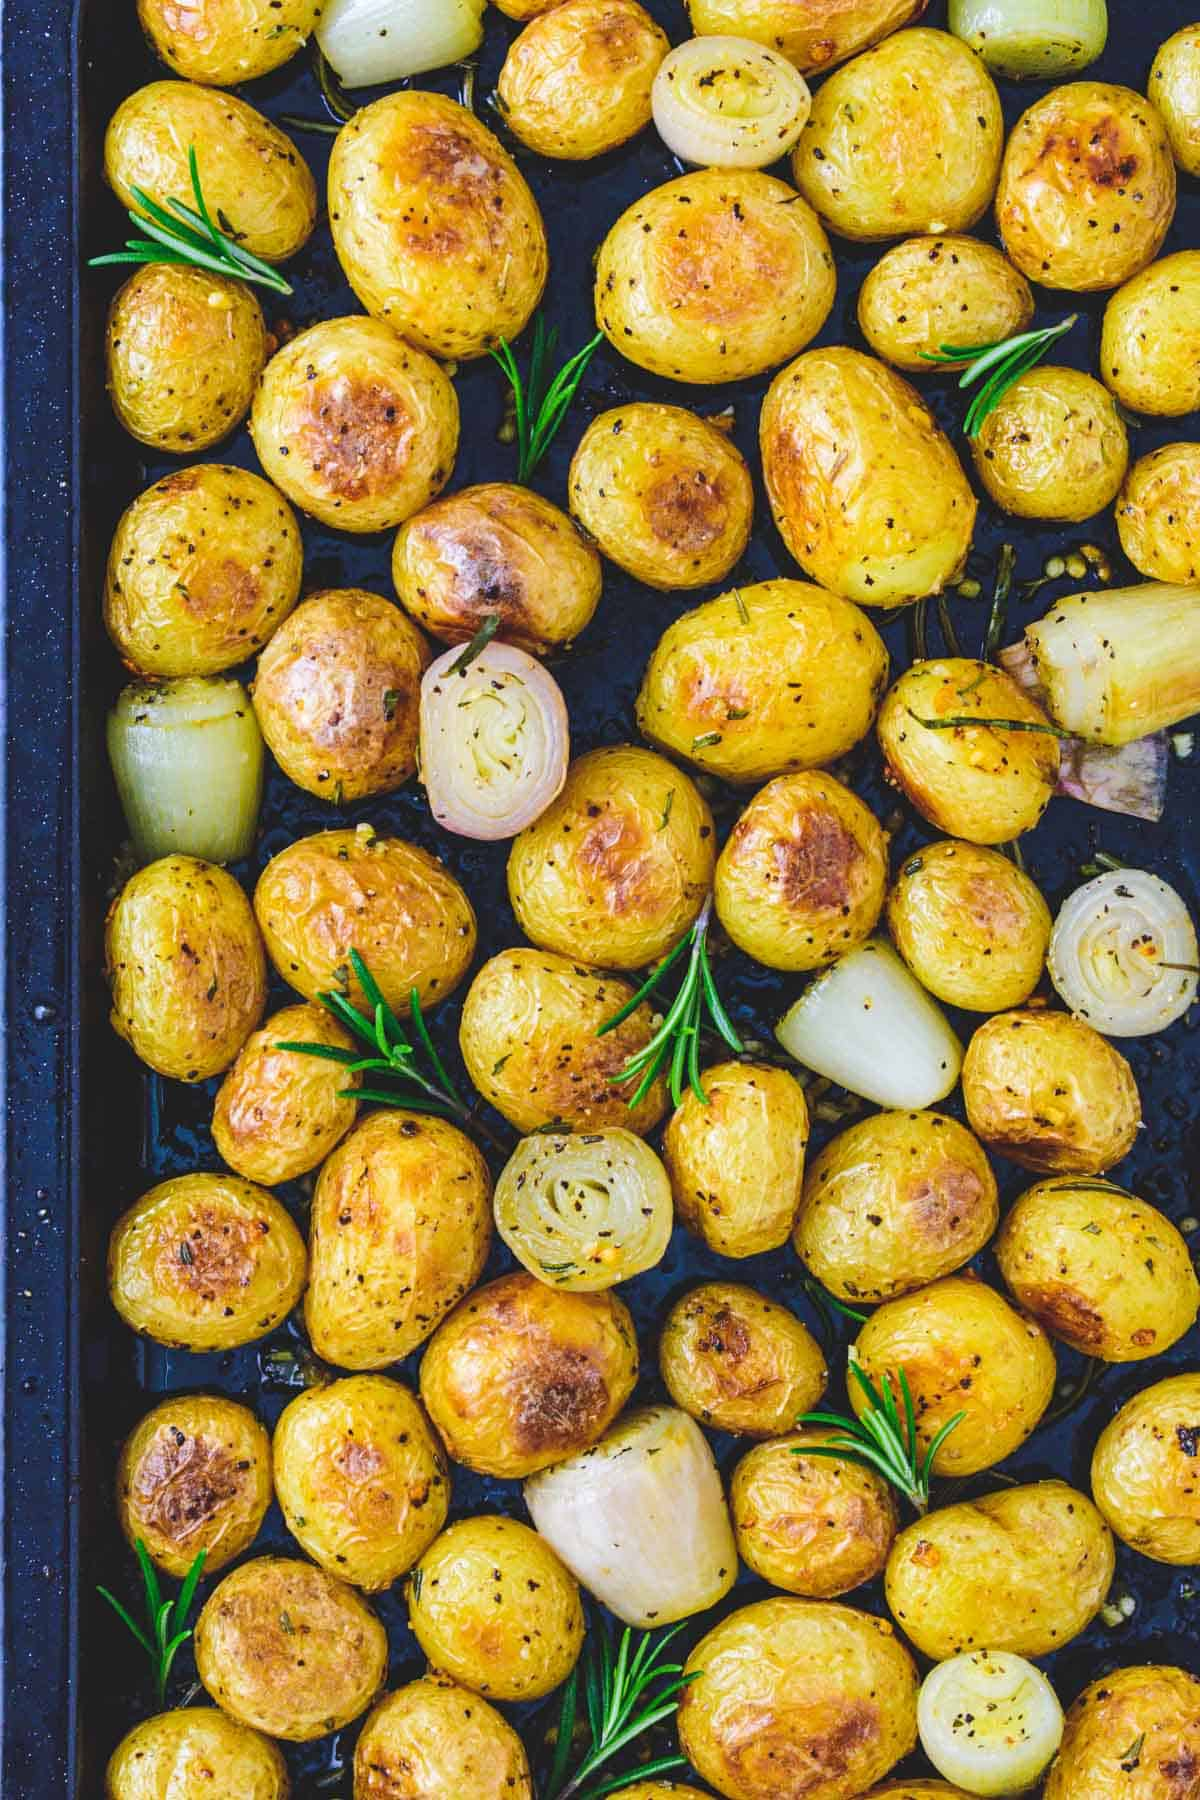 Roasted new potatoes with garlic, rosemary and shallots on baking tray